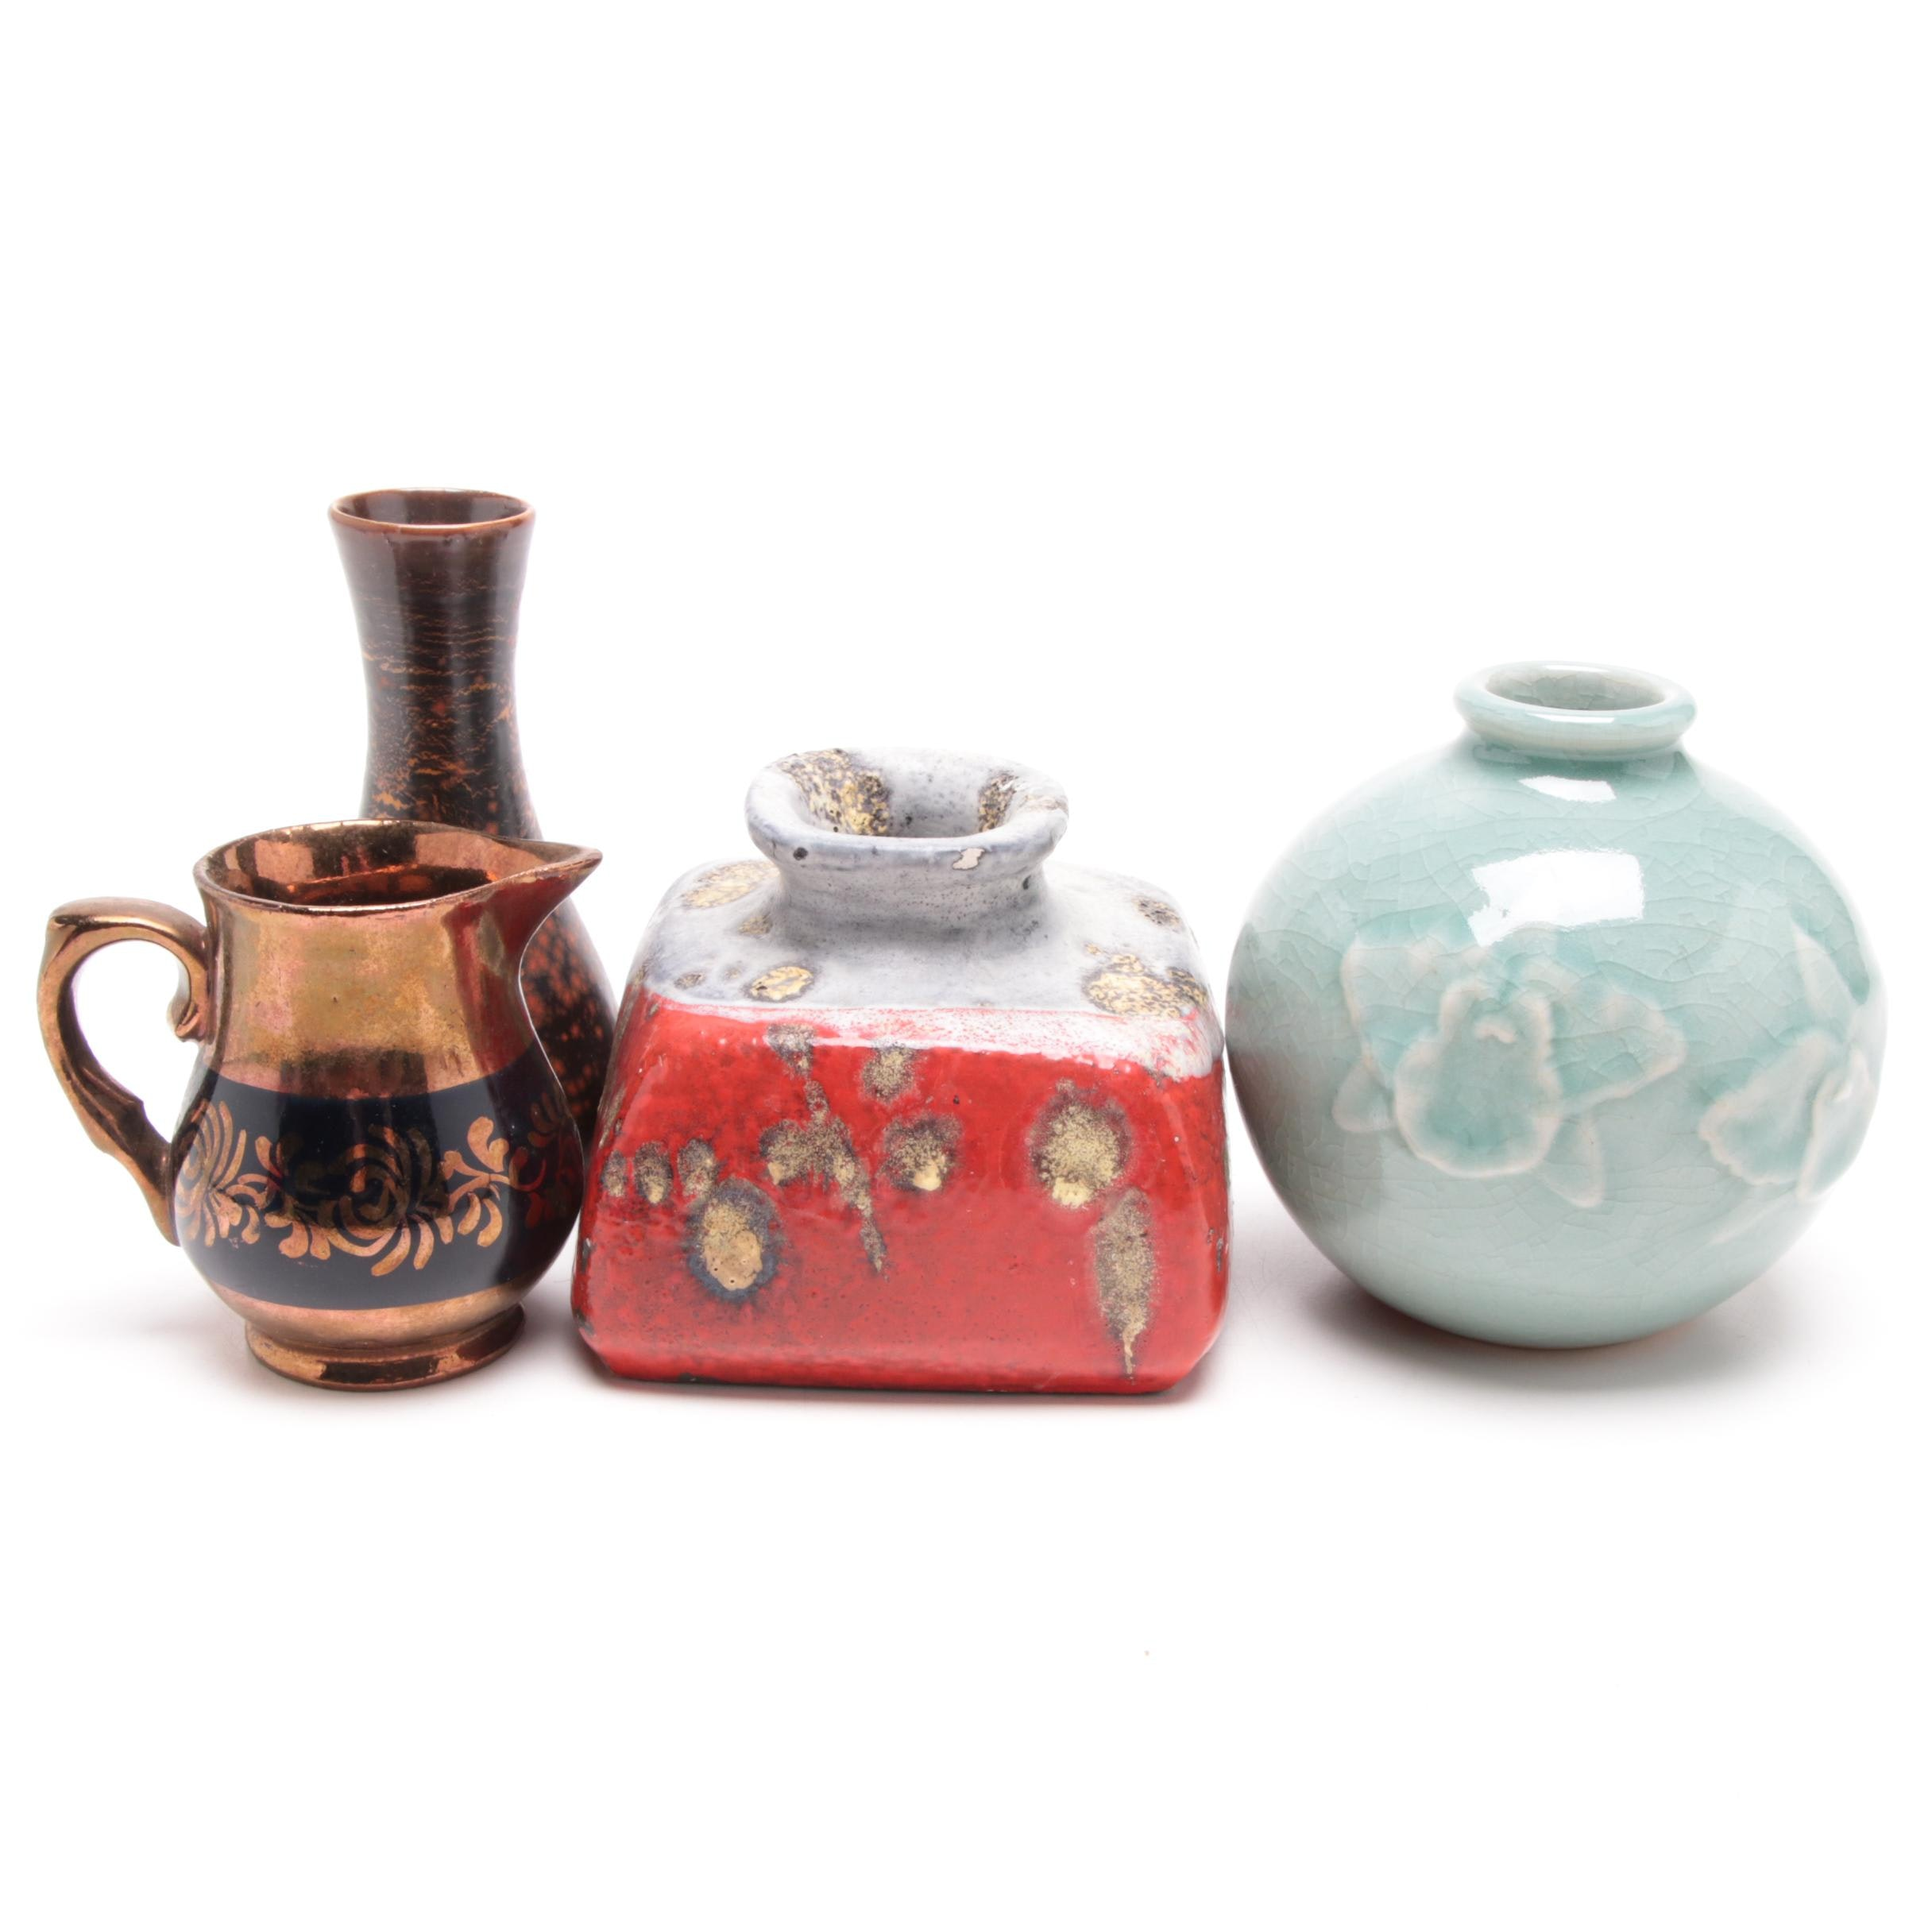 Marcello Fantoni Fantoni Vase with Other Tableware and Decor